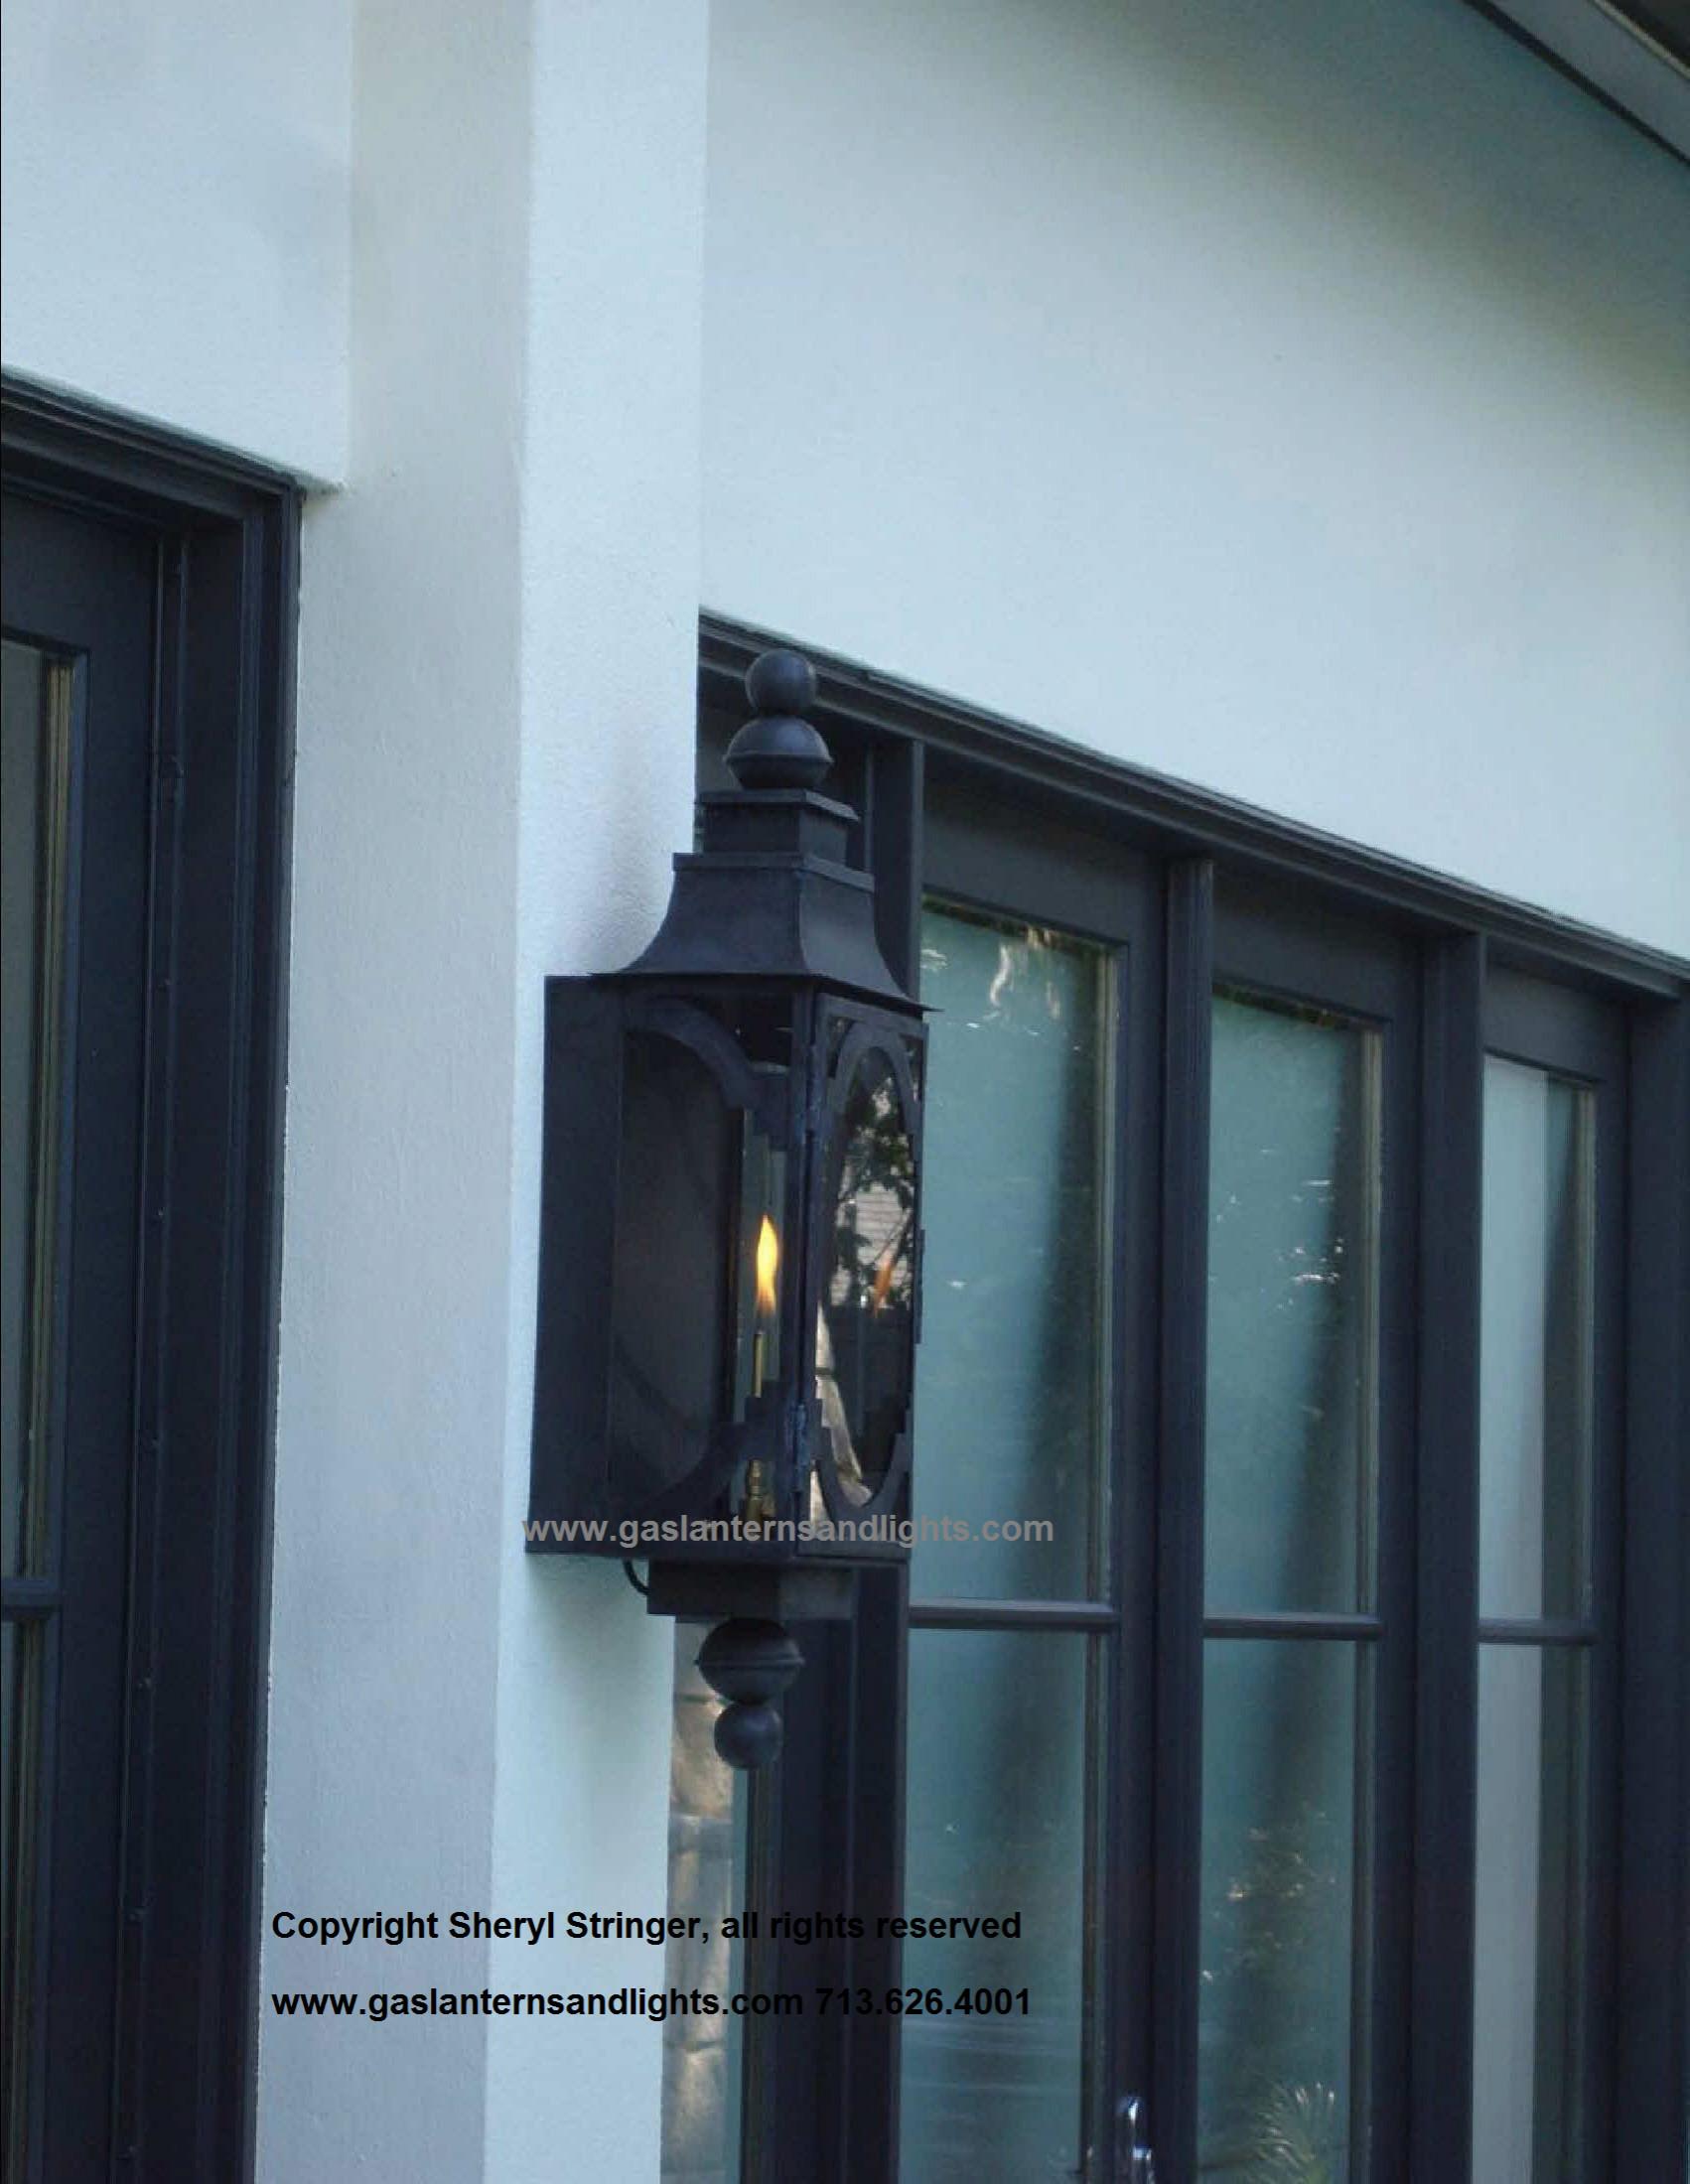 Sheryl's Santa Barbara Gas Lantern with Dark Patina Finish